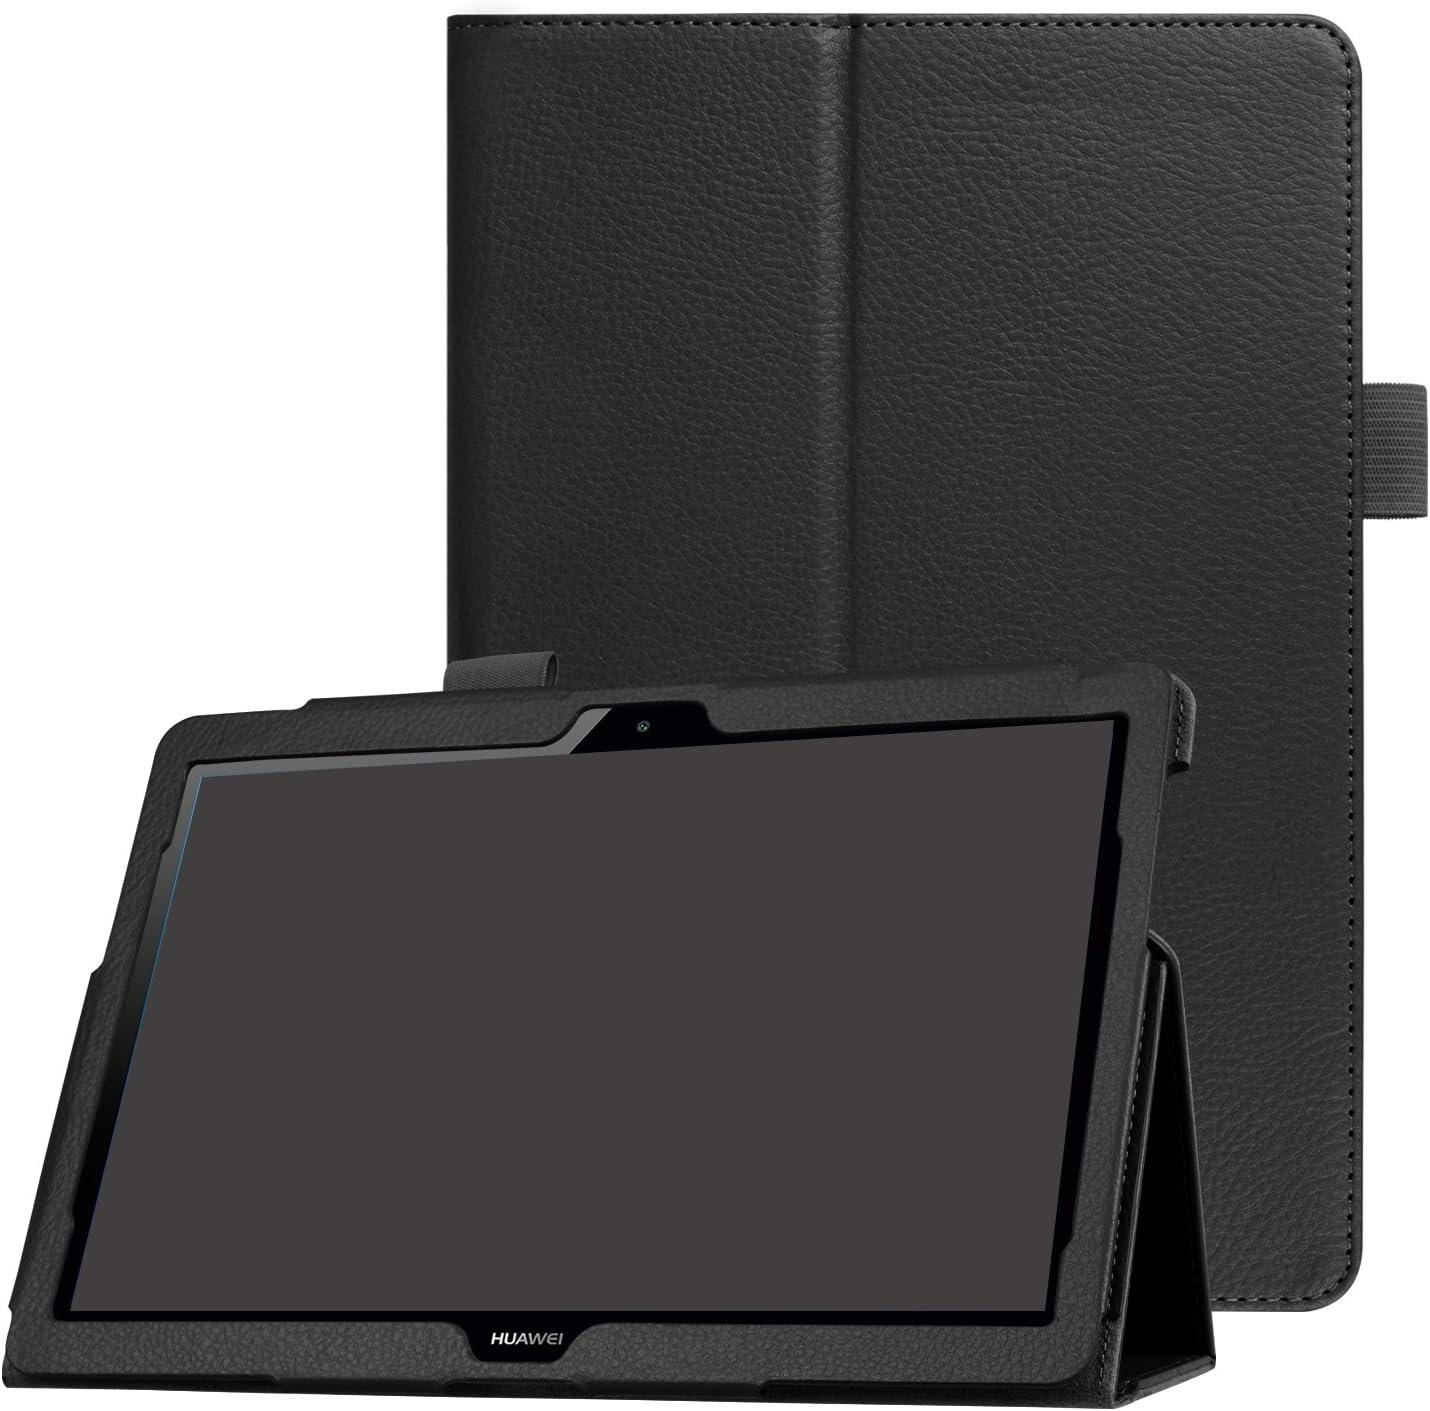 Funda Asng Huawei MediaPad T3 10 2017 de 9.6.Negro